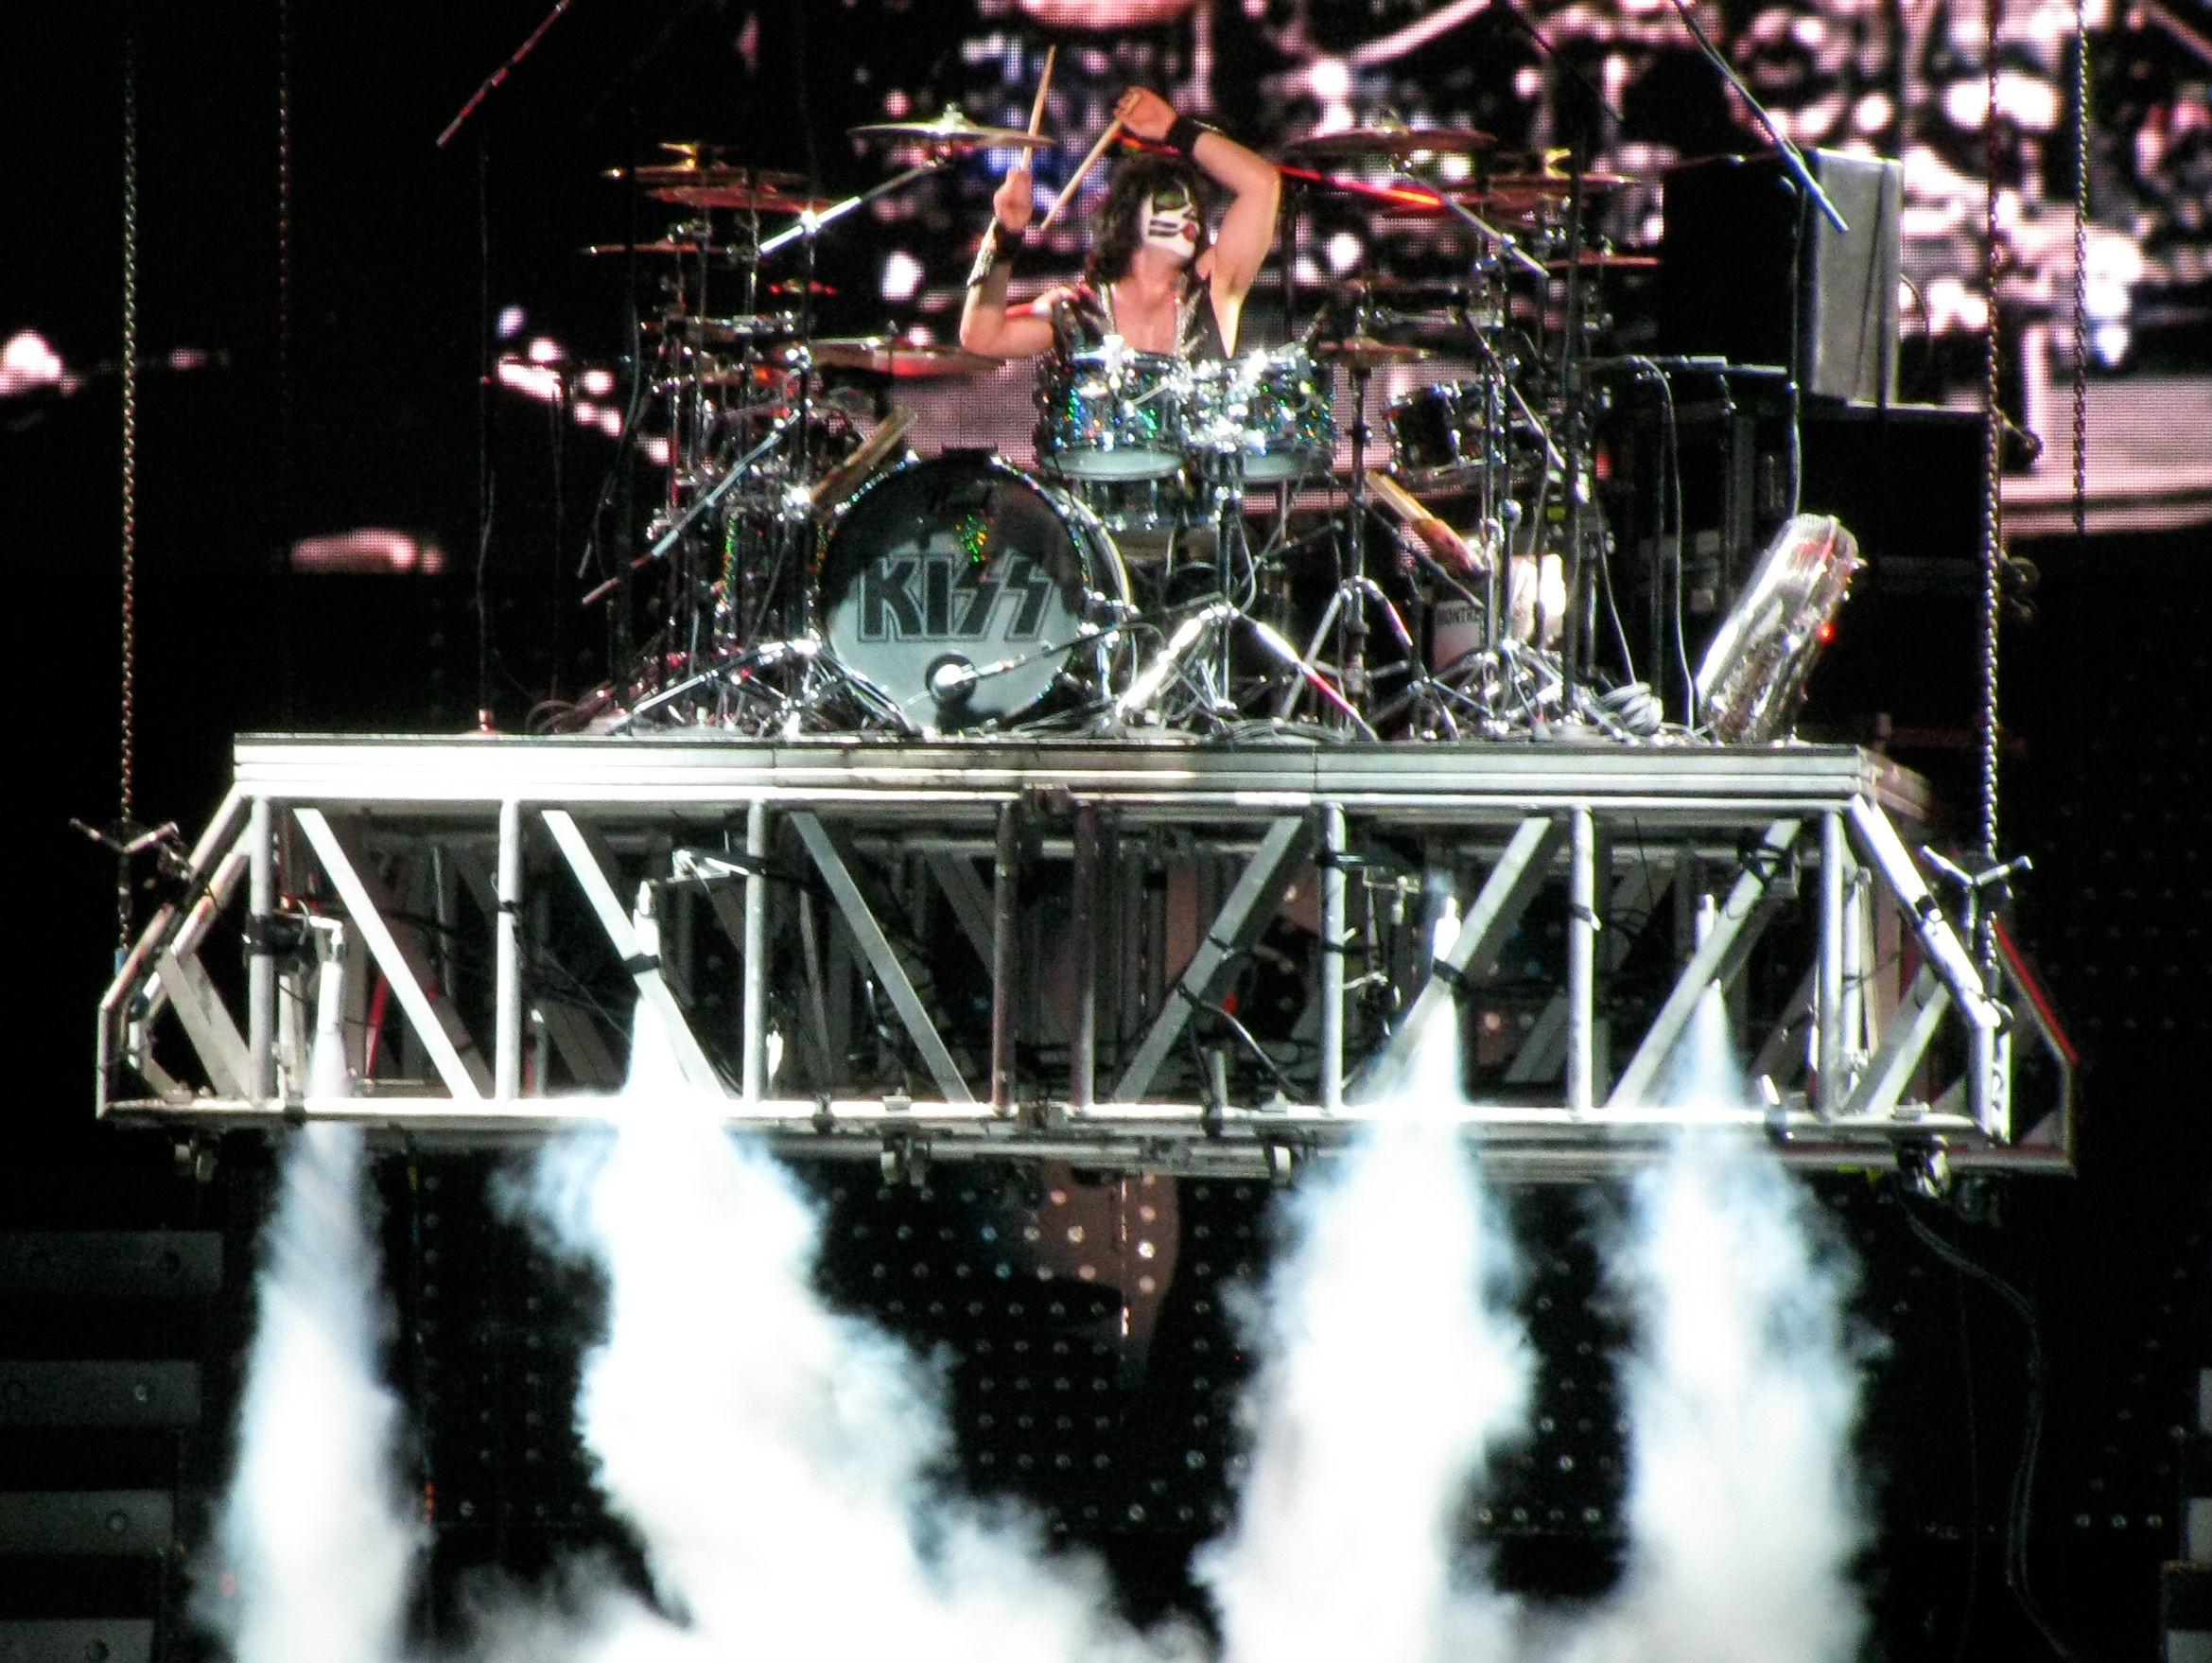 Kiss heavy metal rock bands drums concert wallpaper | | 74065 |  WallpaperUP